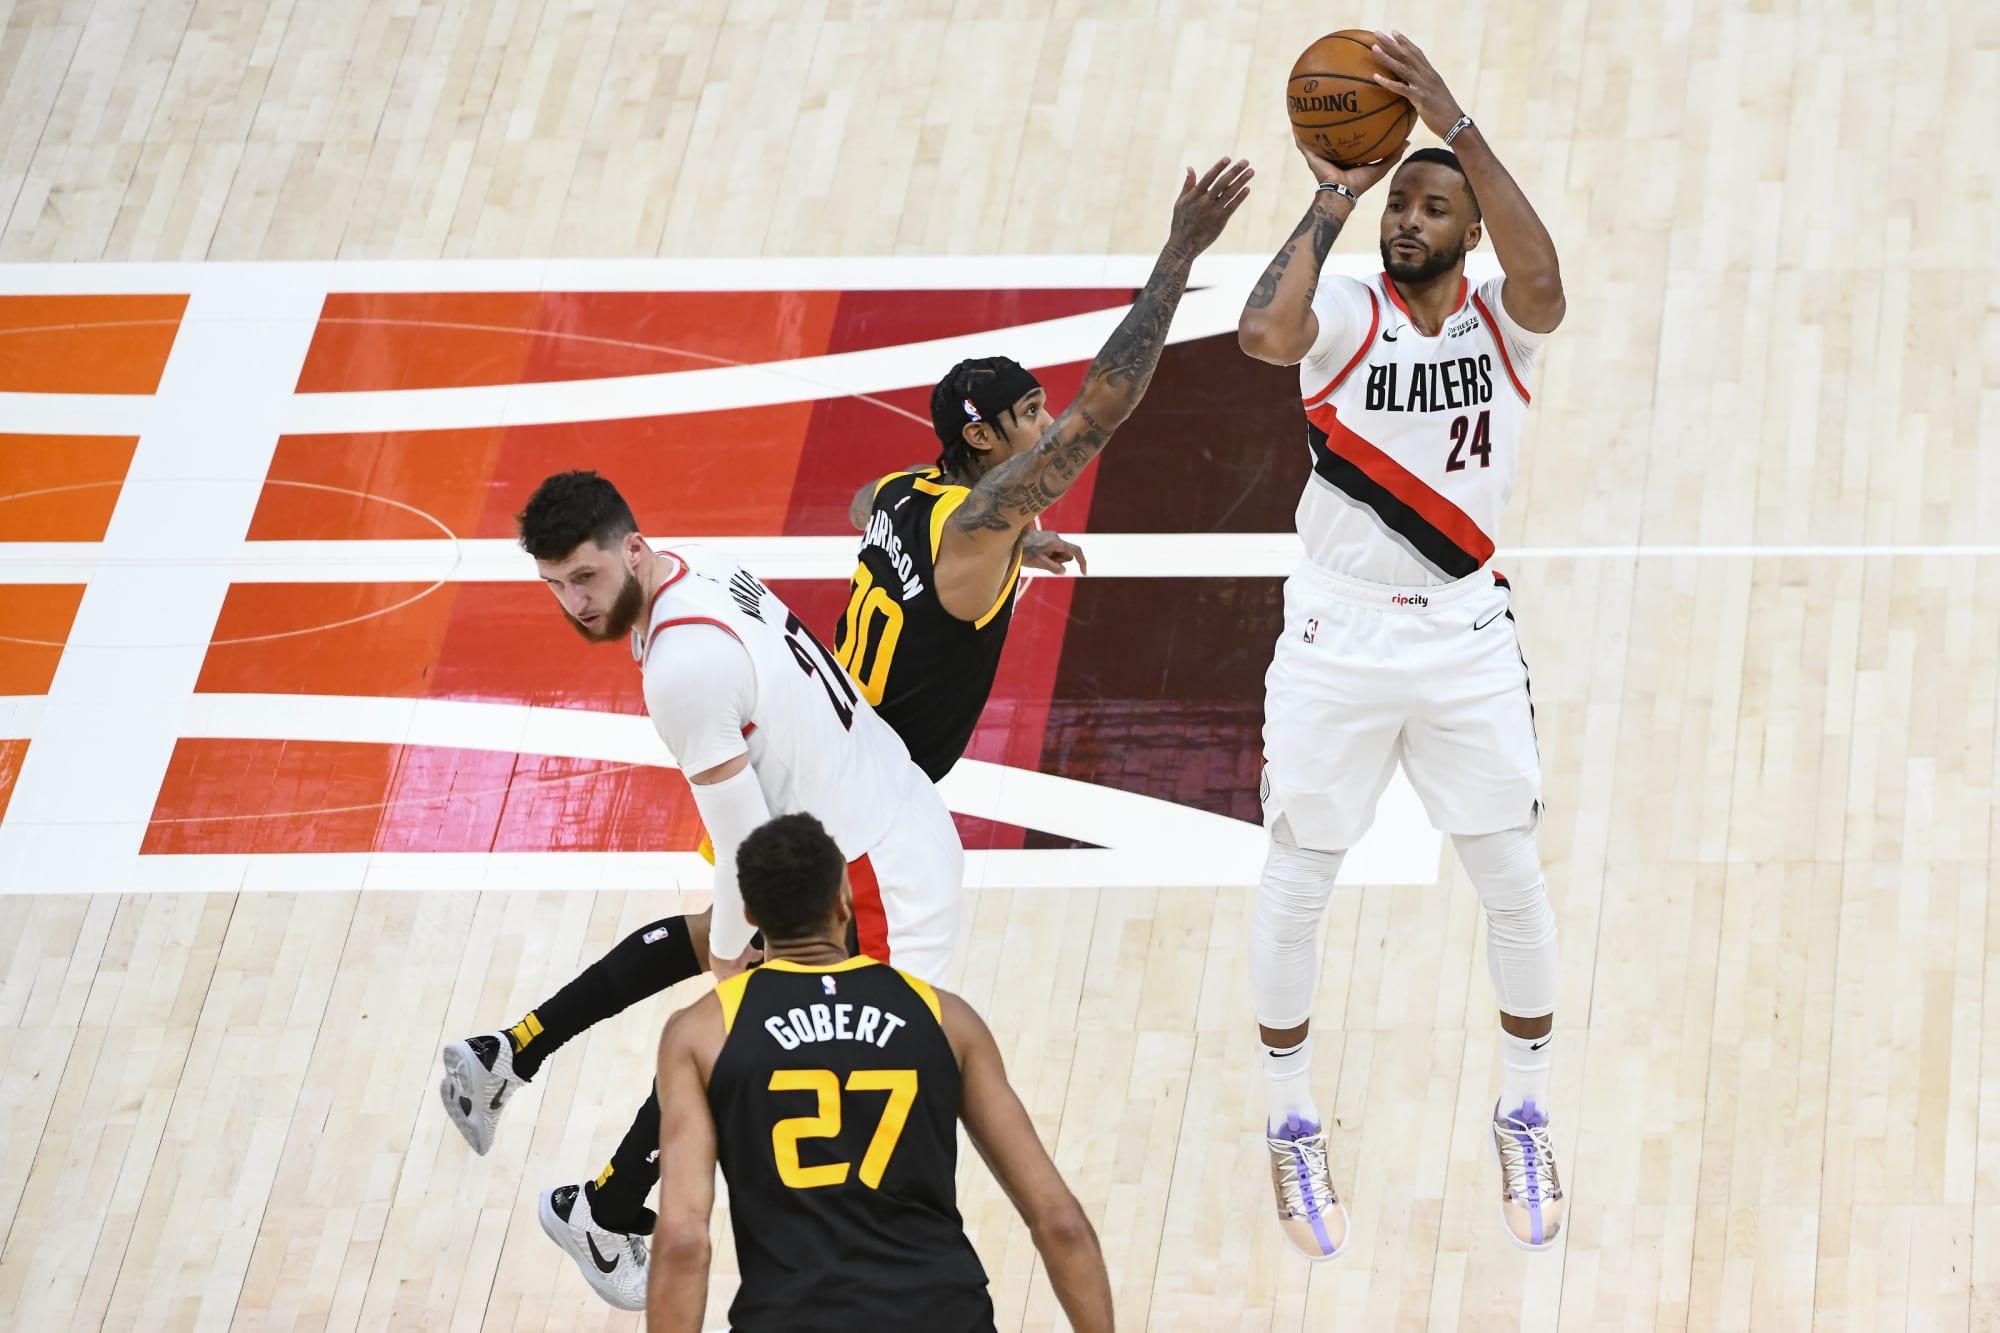 Toronto Raptors: Top 10 No. 46 and 47 overall picks in NBA Draft history